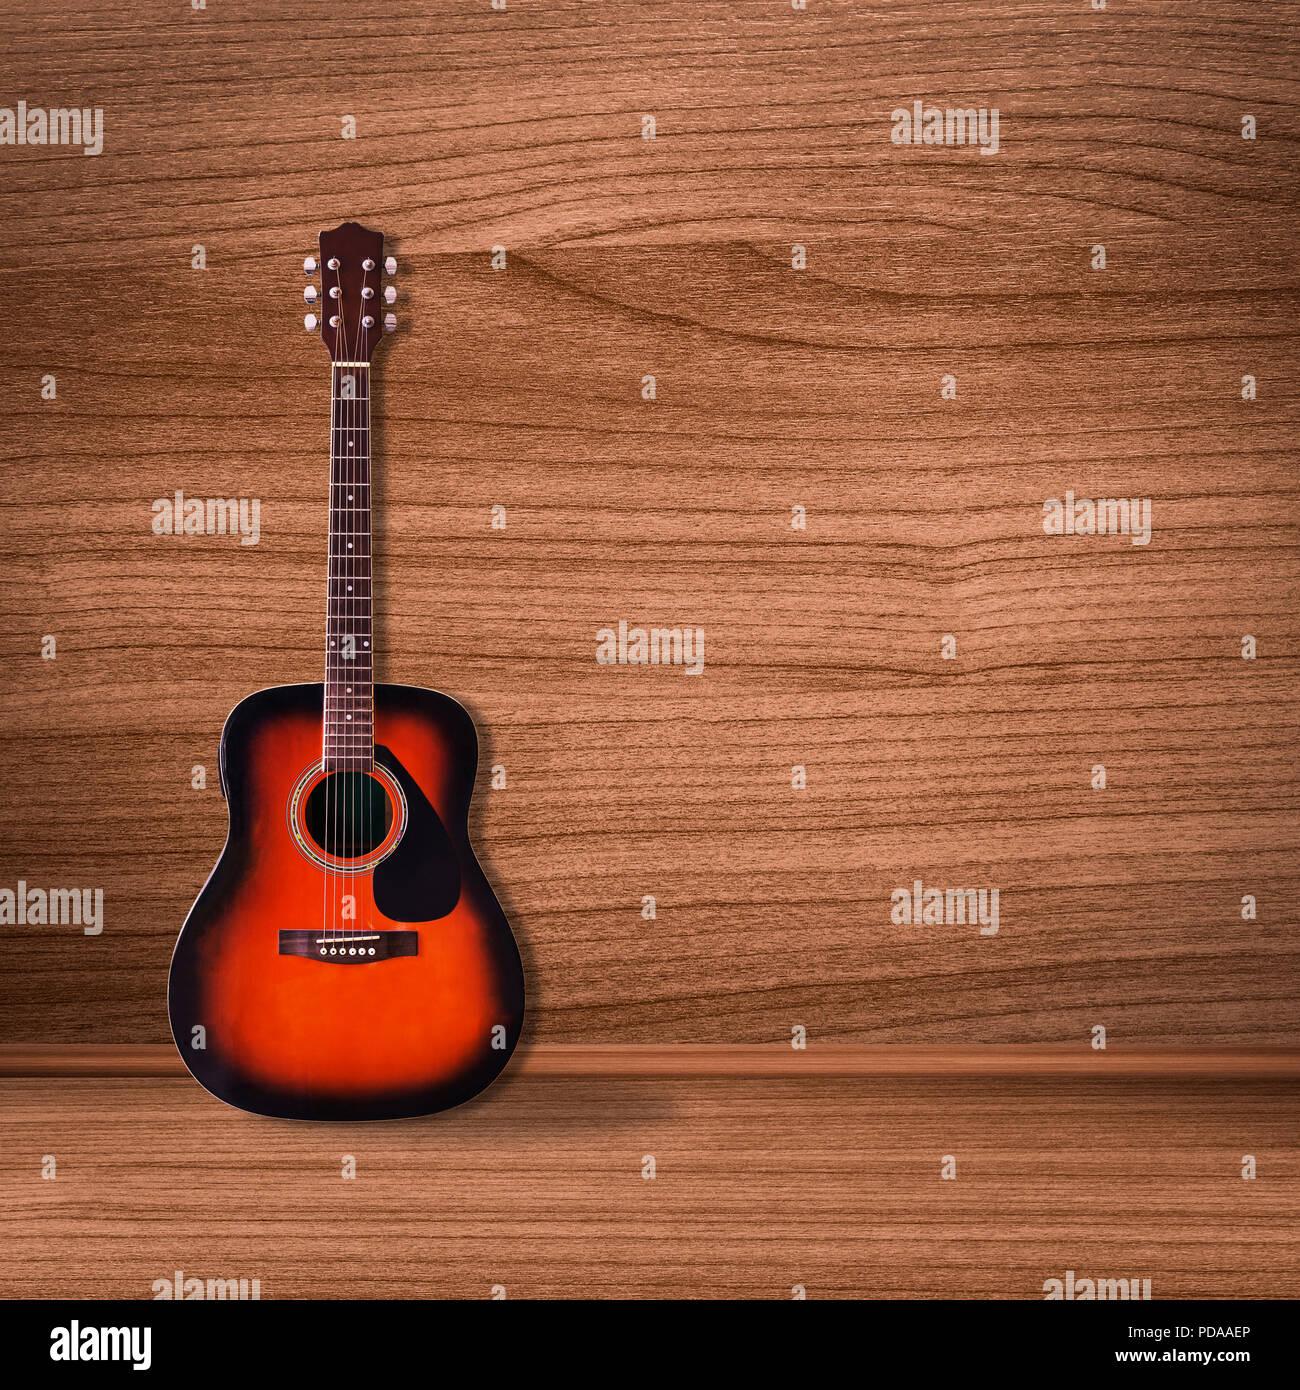 Wallpaper Guitar Stock Photos Wallpaper Guitar Stock